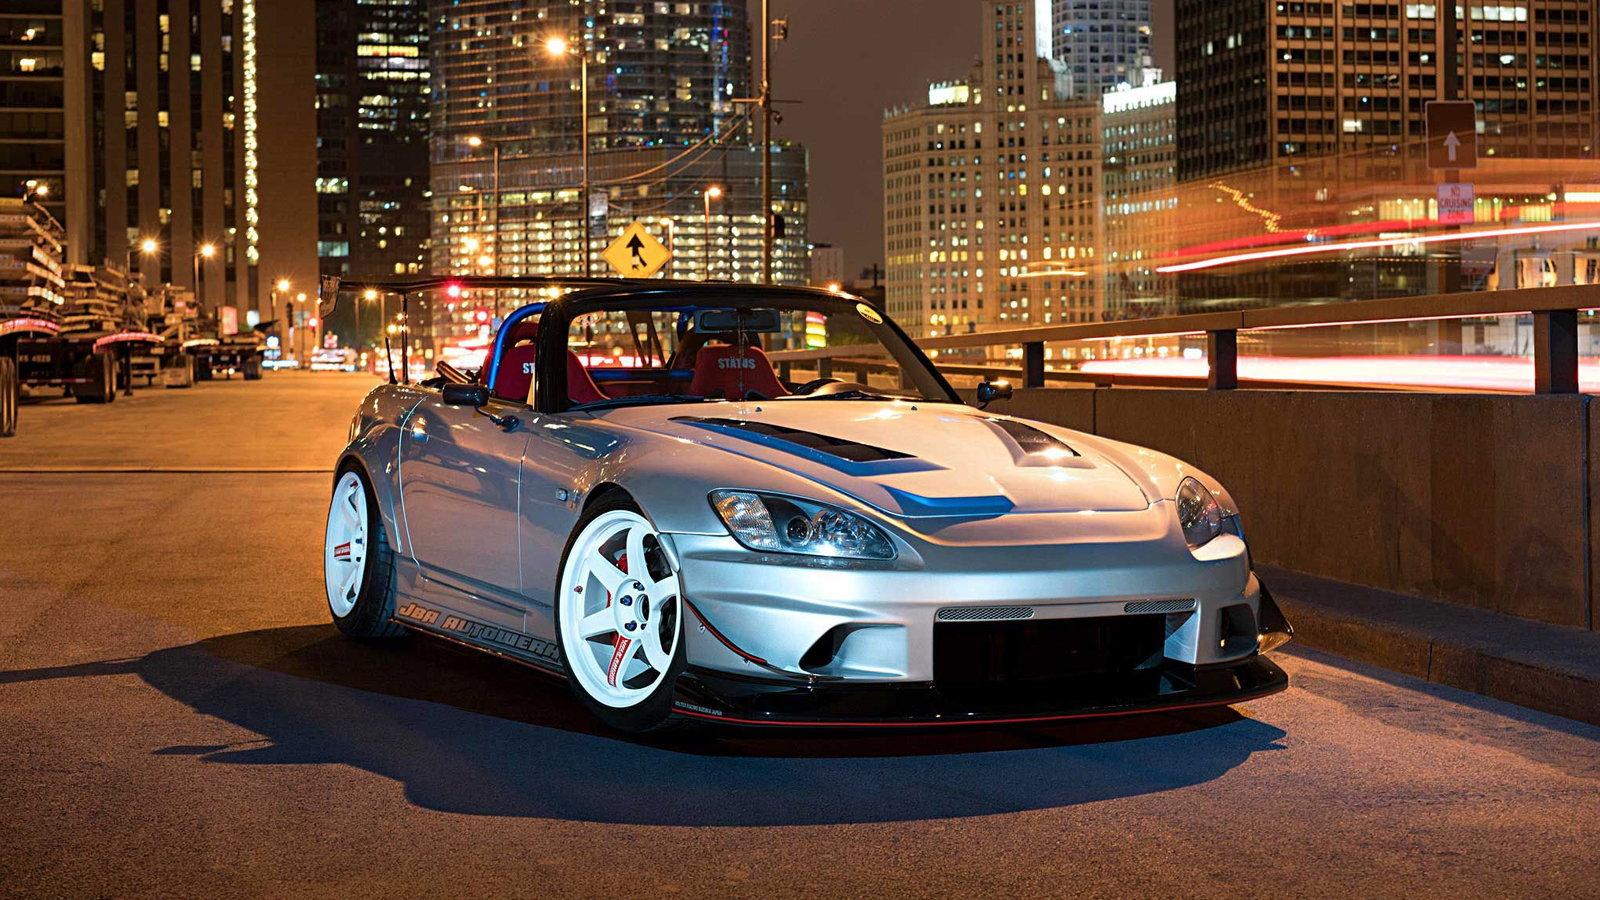 Custom Honda S2000 is a Clash of Build Styles